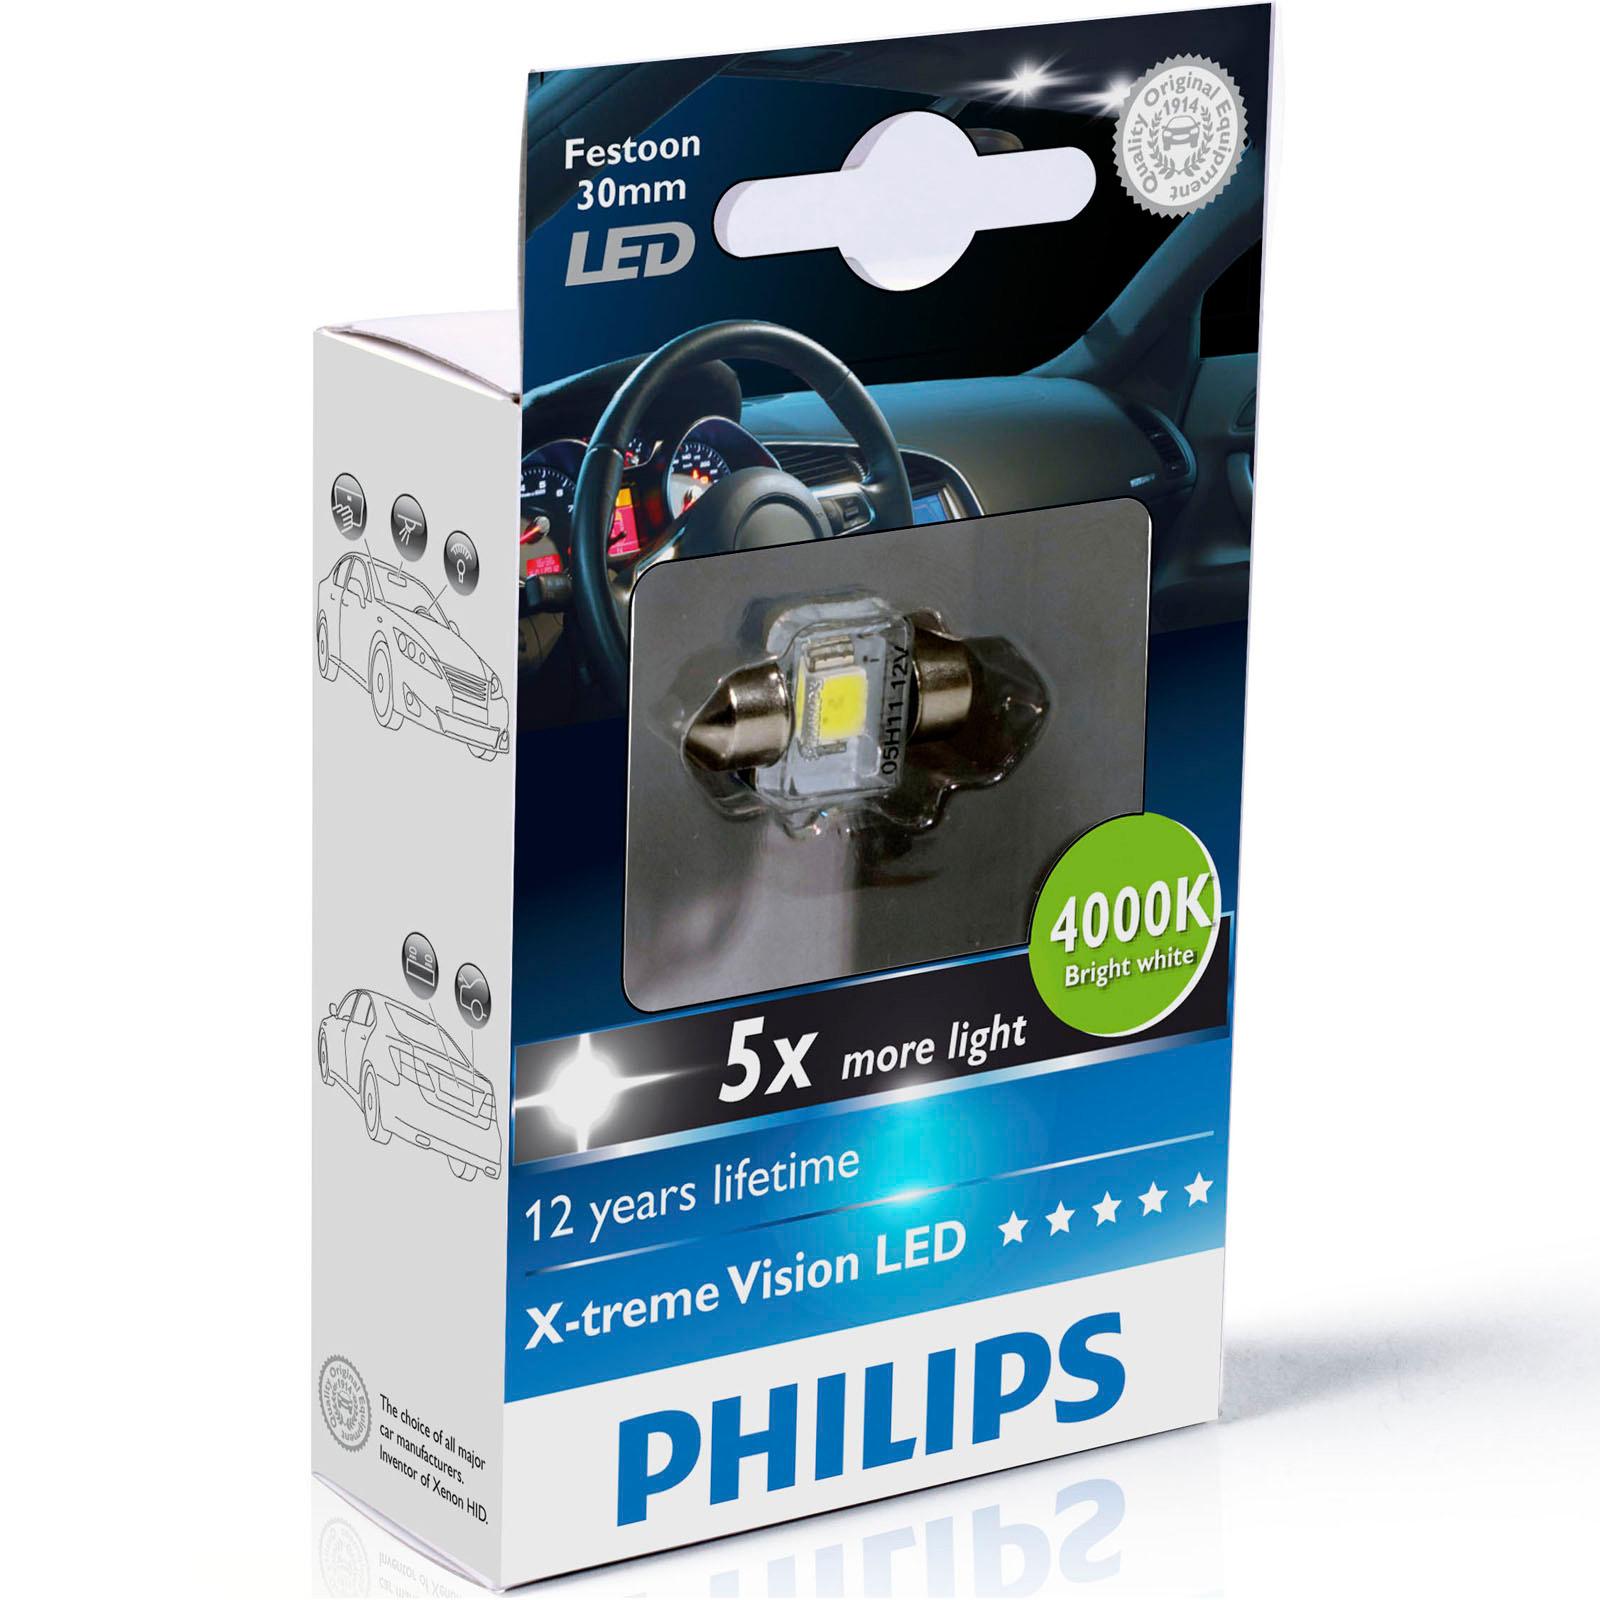 philips x treme vision feston voiture del ampoules disponible en 4000k 6000k ebay. Black Bedroom Furniture Sets. Home Design Ideas